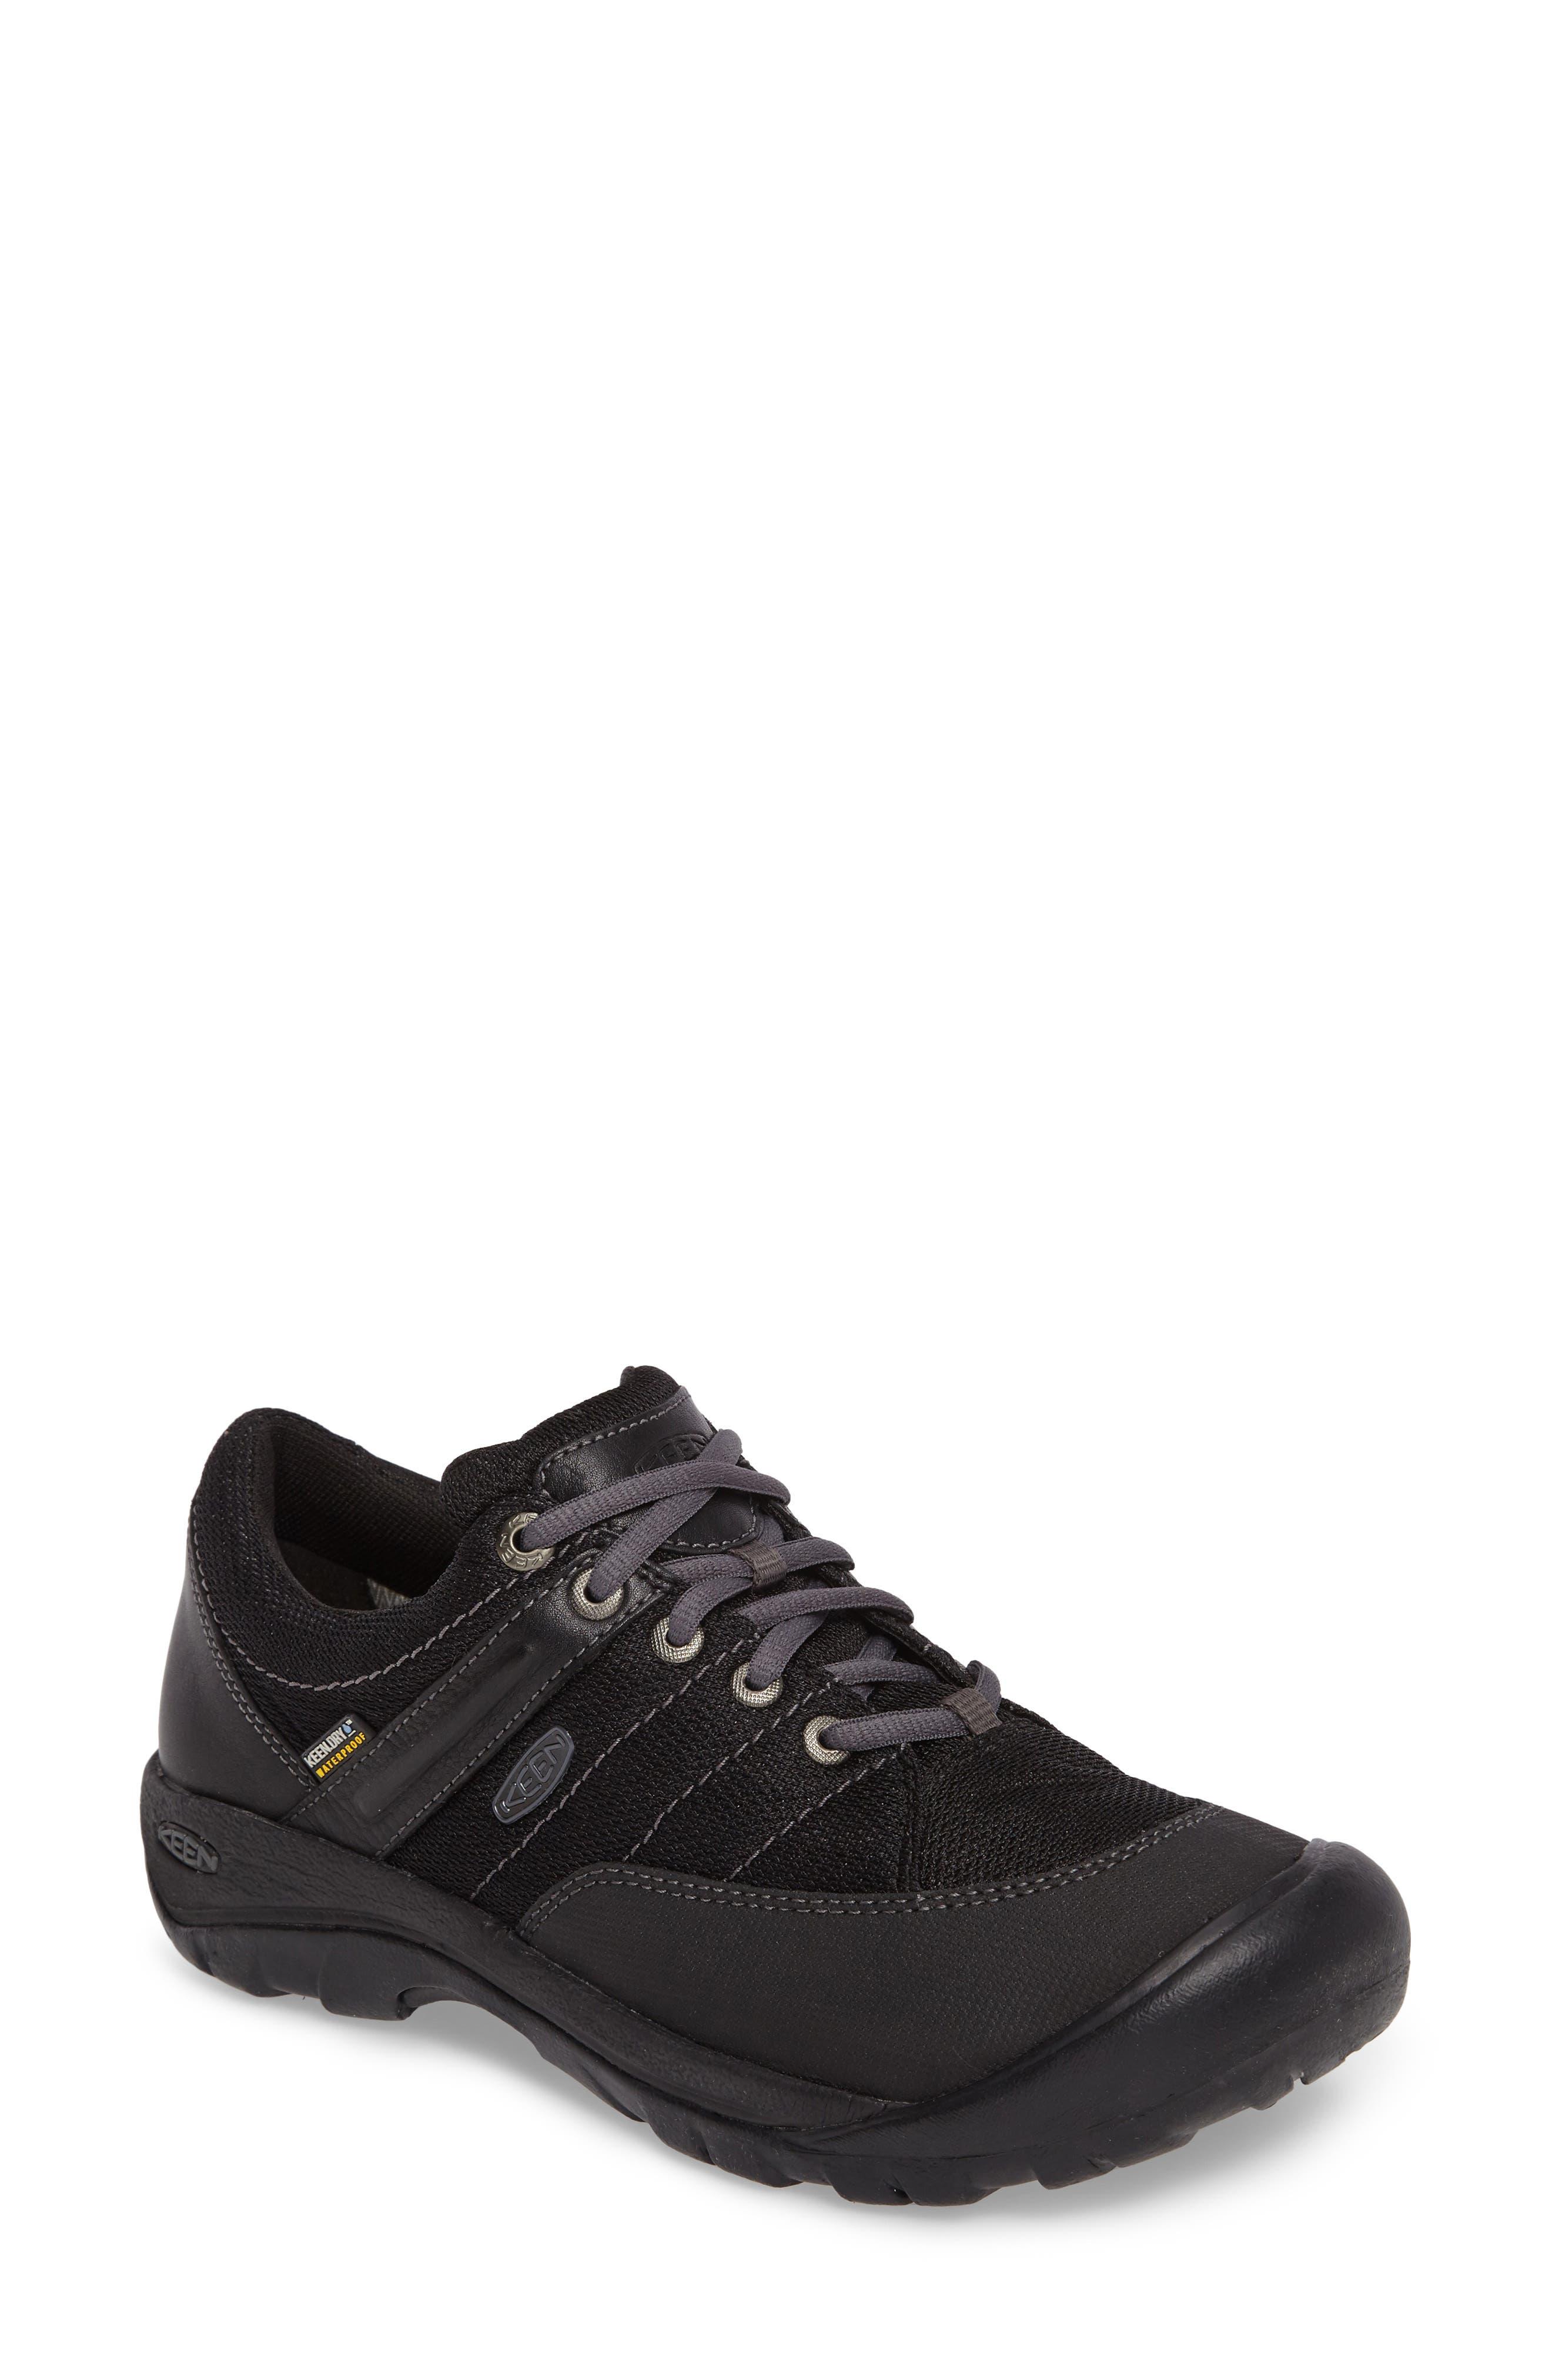 Presidio Waterproof Sport Sneaker,                             Main thumbnail 1, color,                             BLACK LEATHER